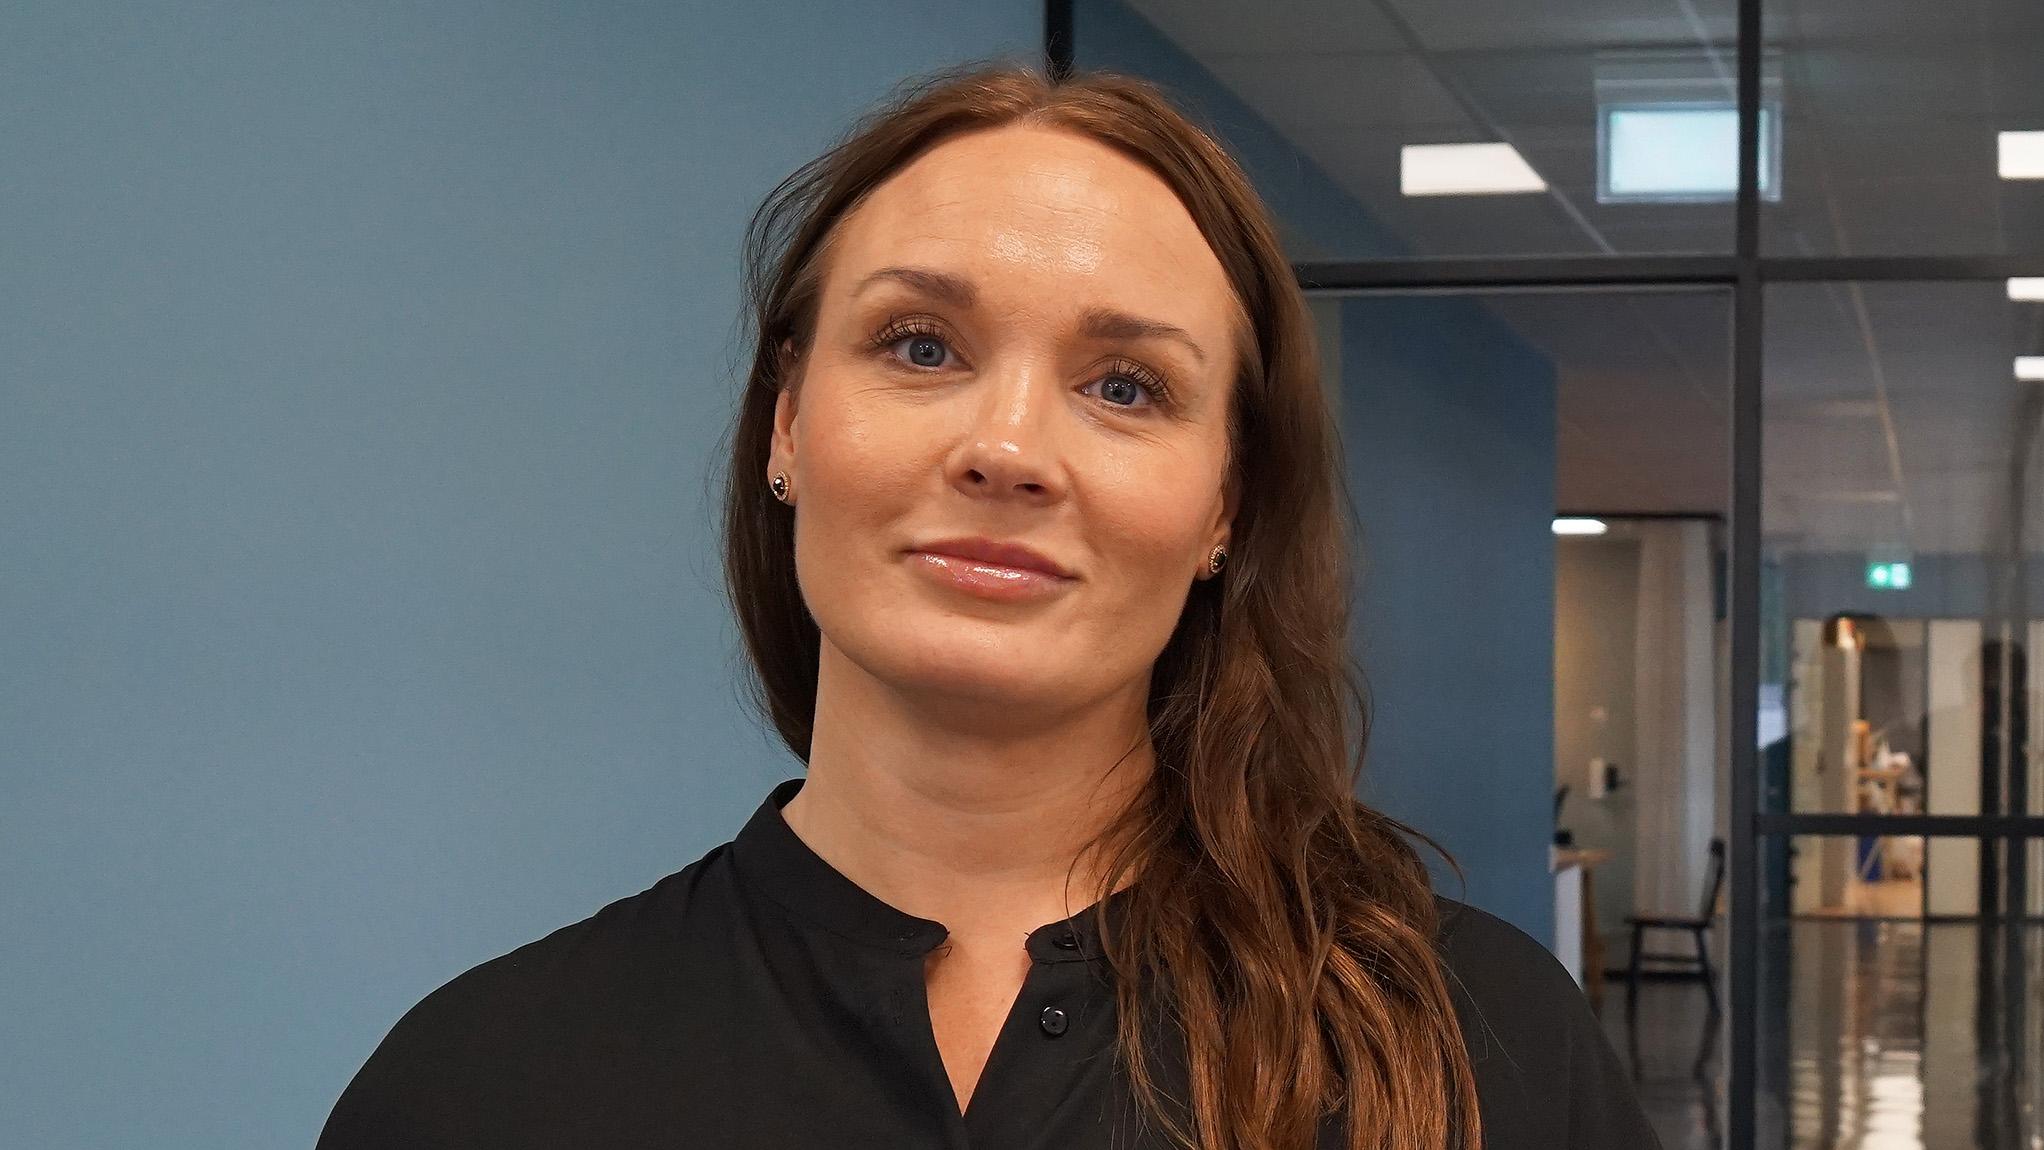 Alexandra Hillman